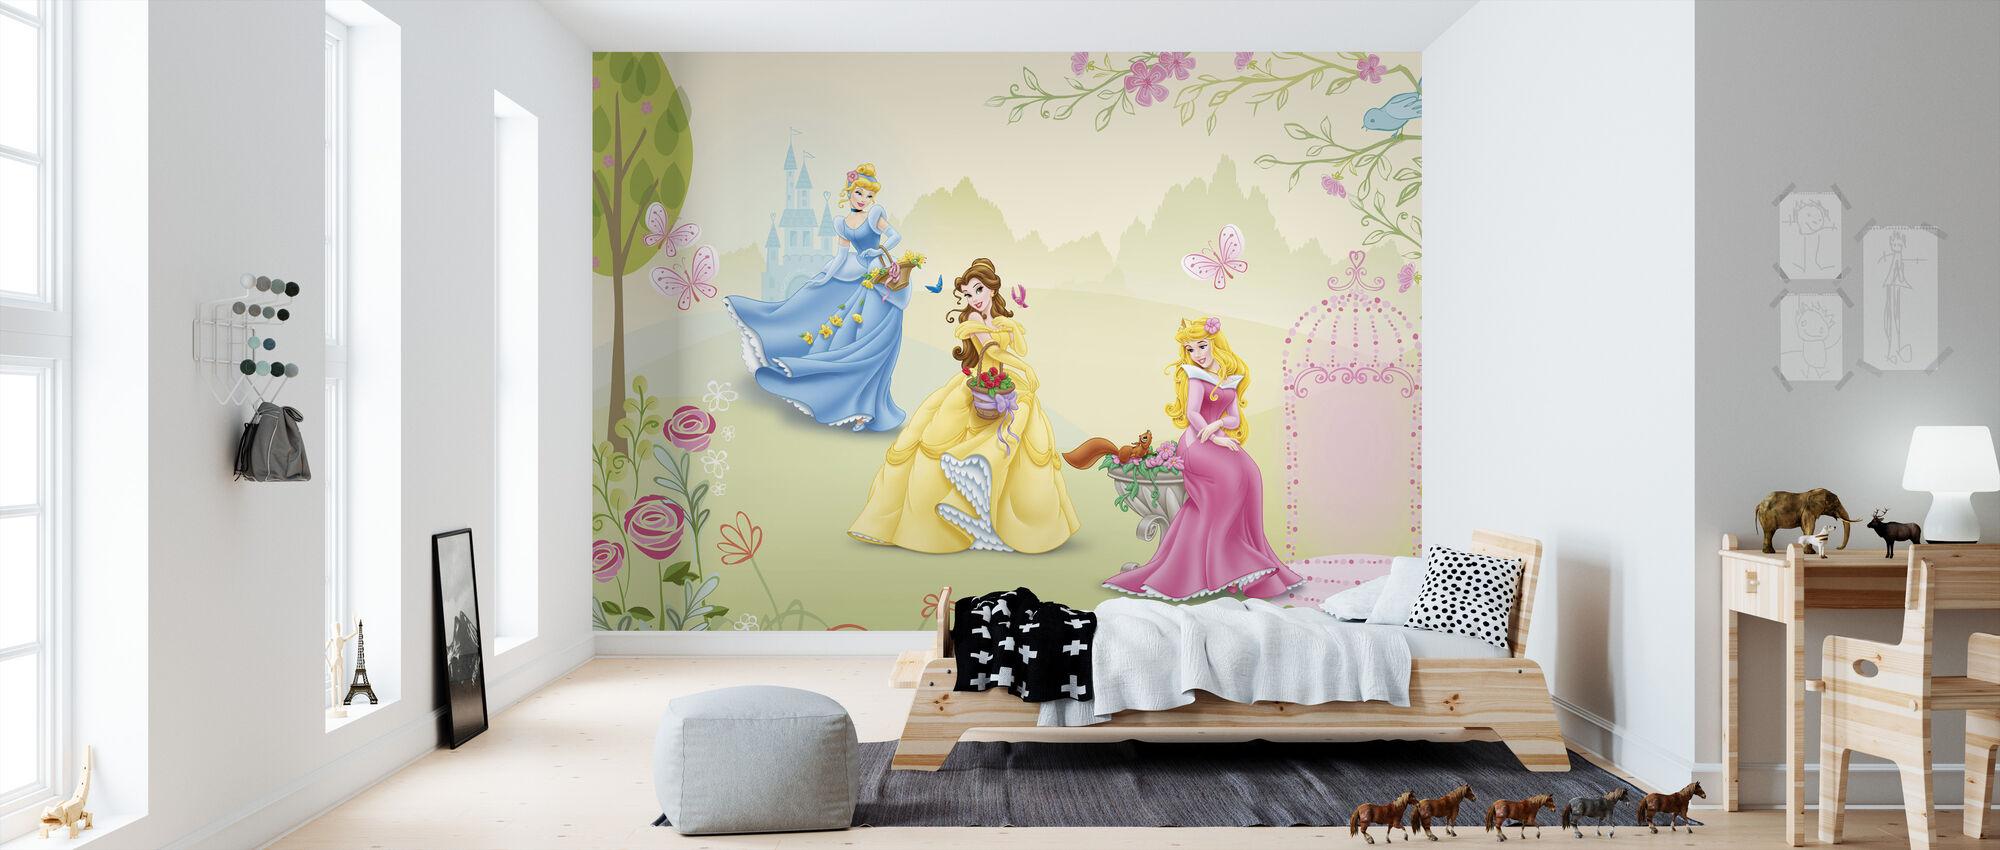 Prinsessa - Ruusupuutarha - Tapetti - Lastenhuone